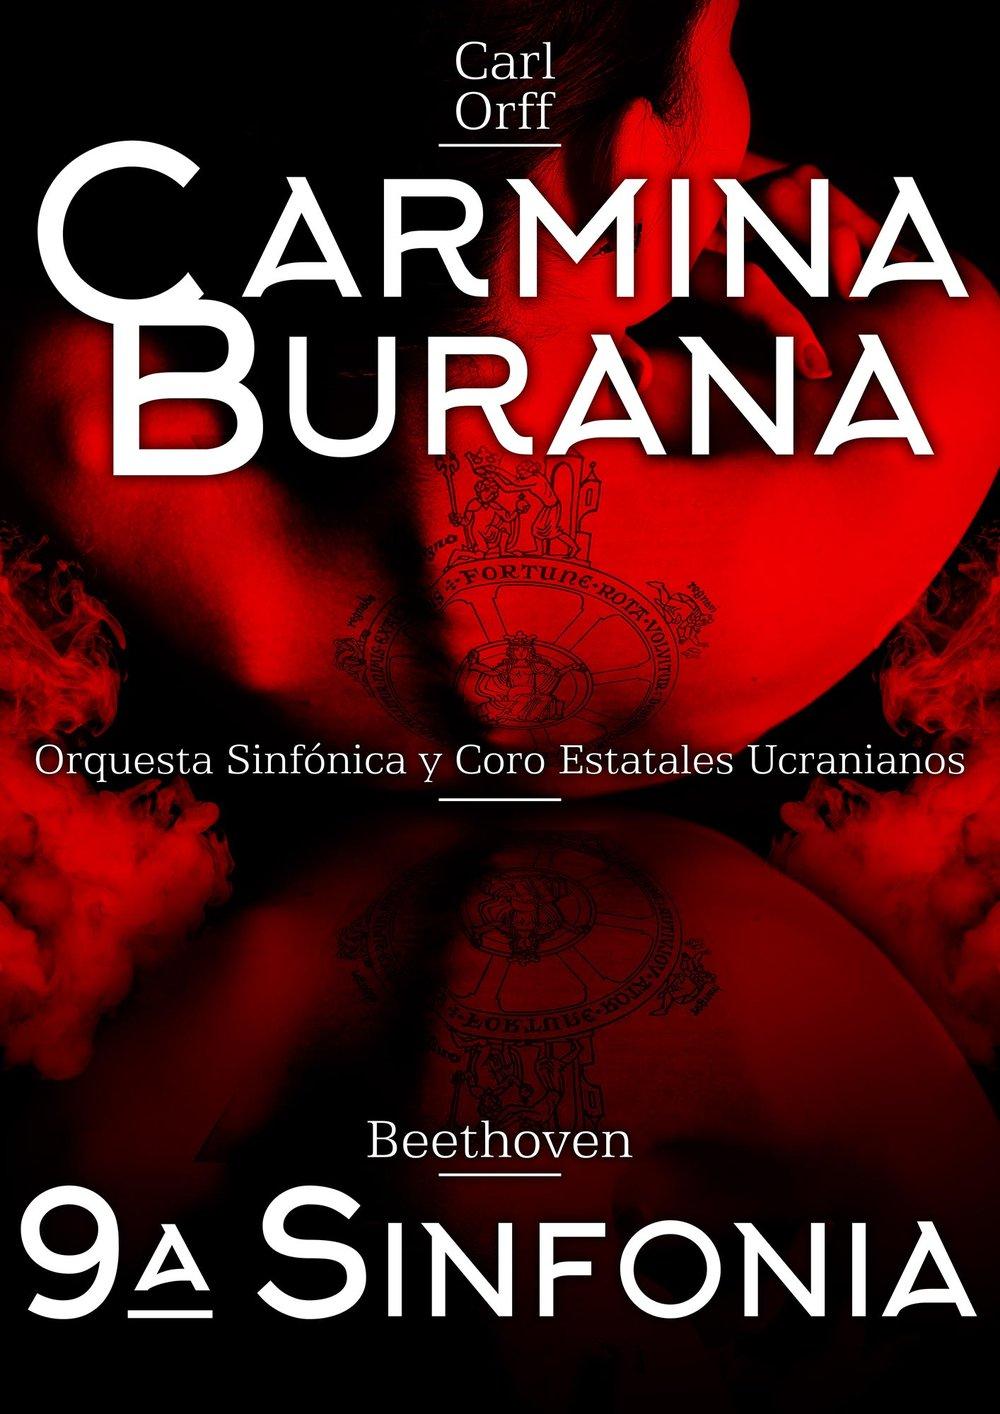 carmina-burana-teatro-carrion-valladolid.jpg